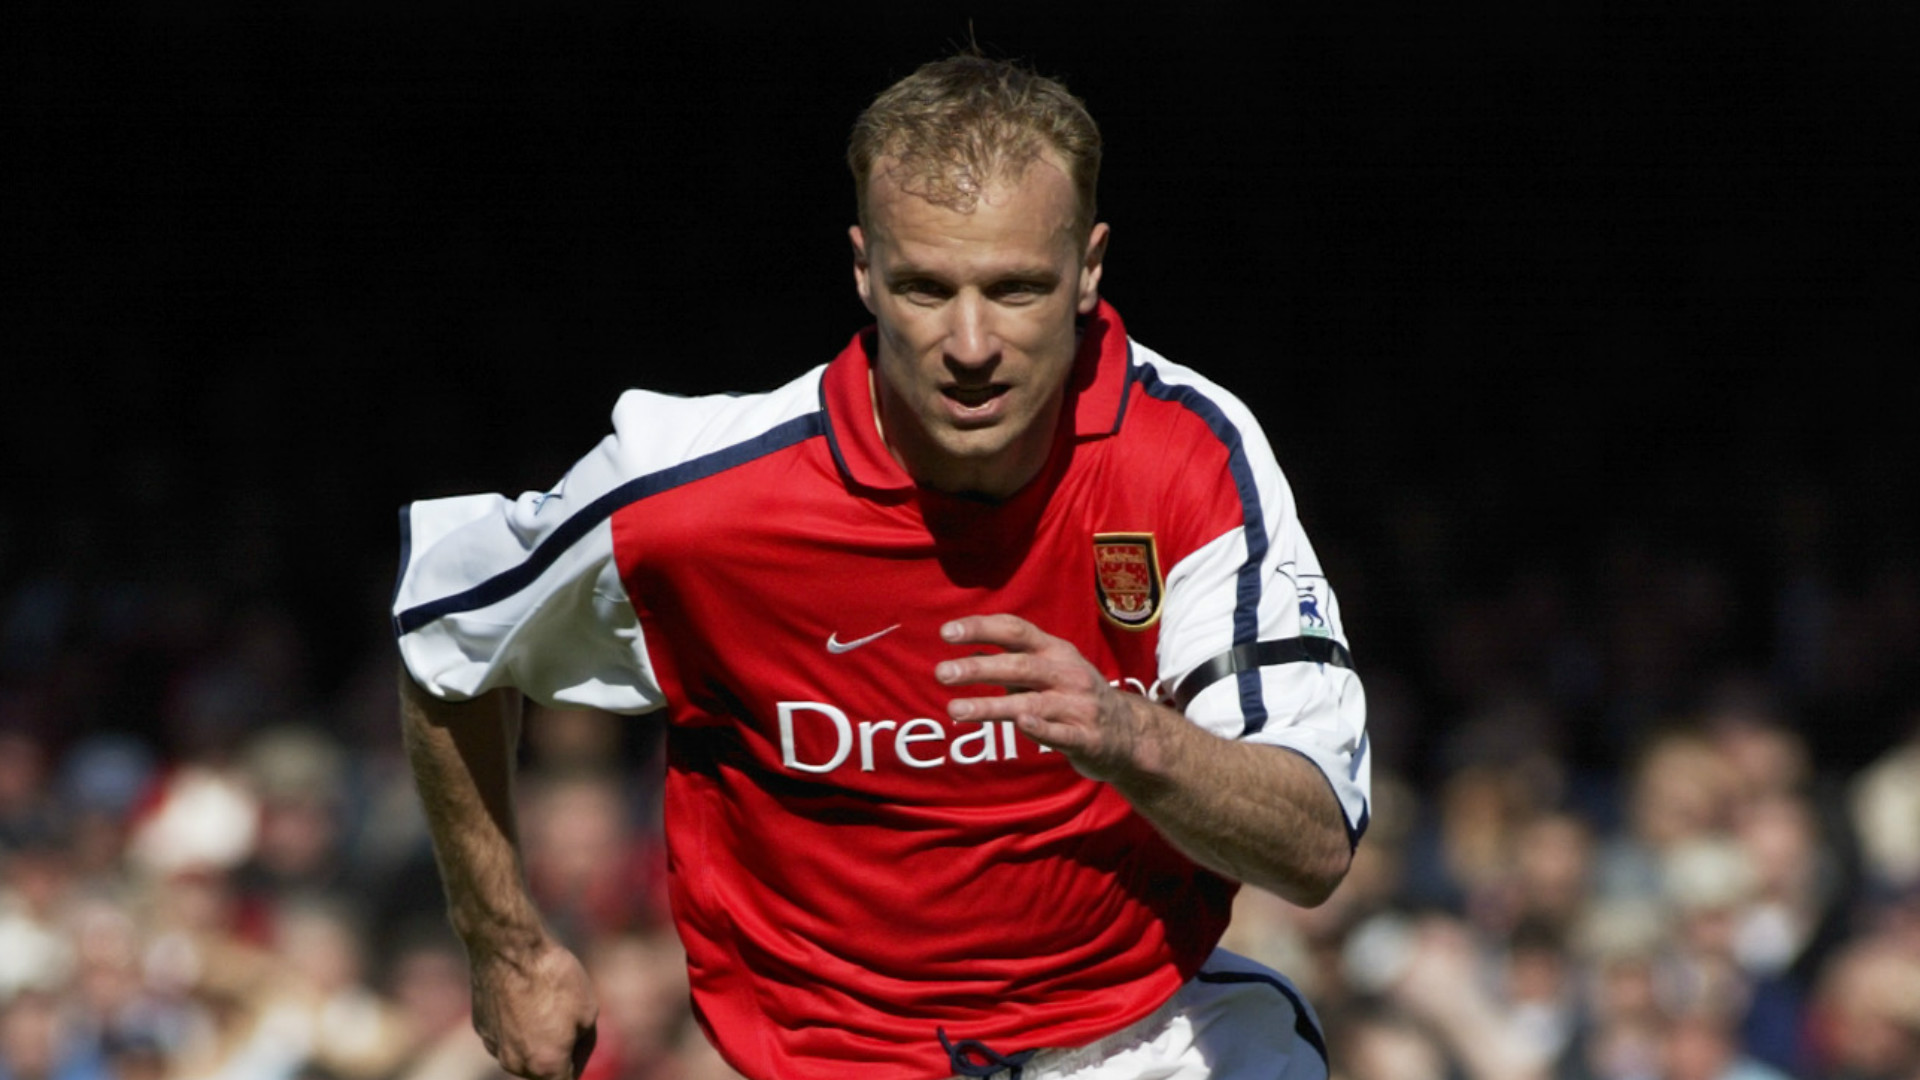 Bergkamp opens door to Arsenal return as Gunners legend waits on offers | Goal.com